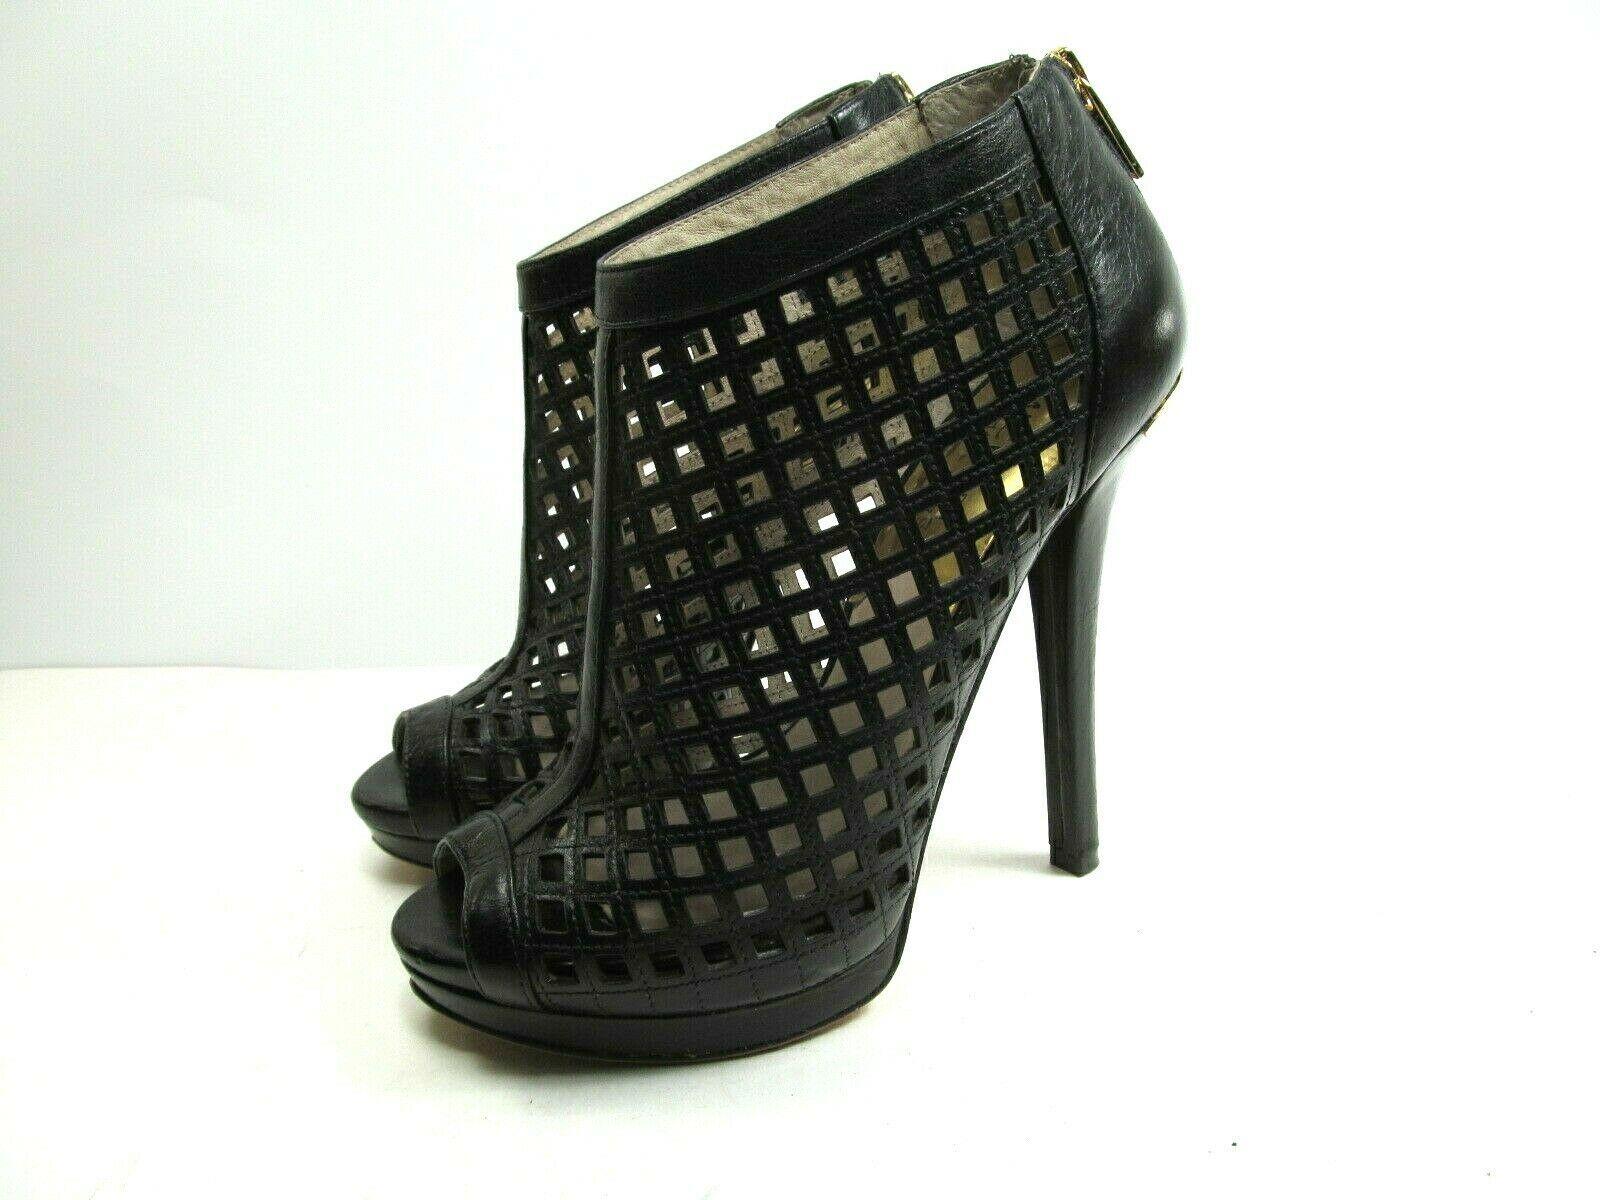 Michael Kors Womens Peep Toe Stilettos Platforms With Cutouts Size US 6 M image 5